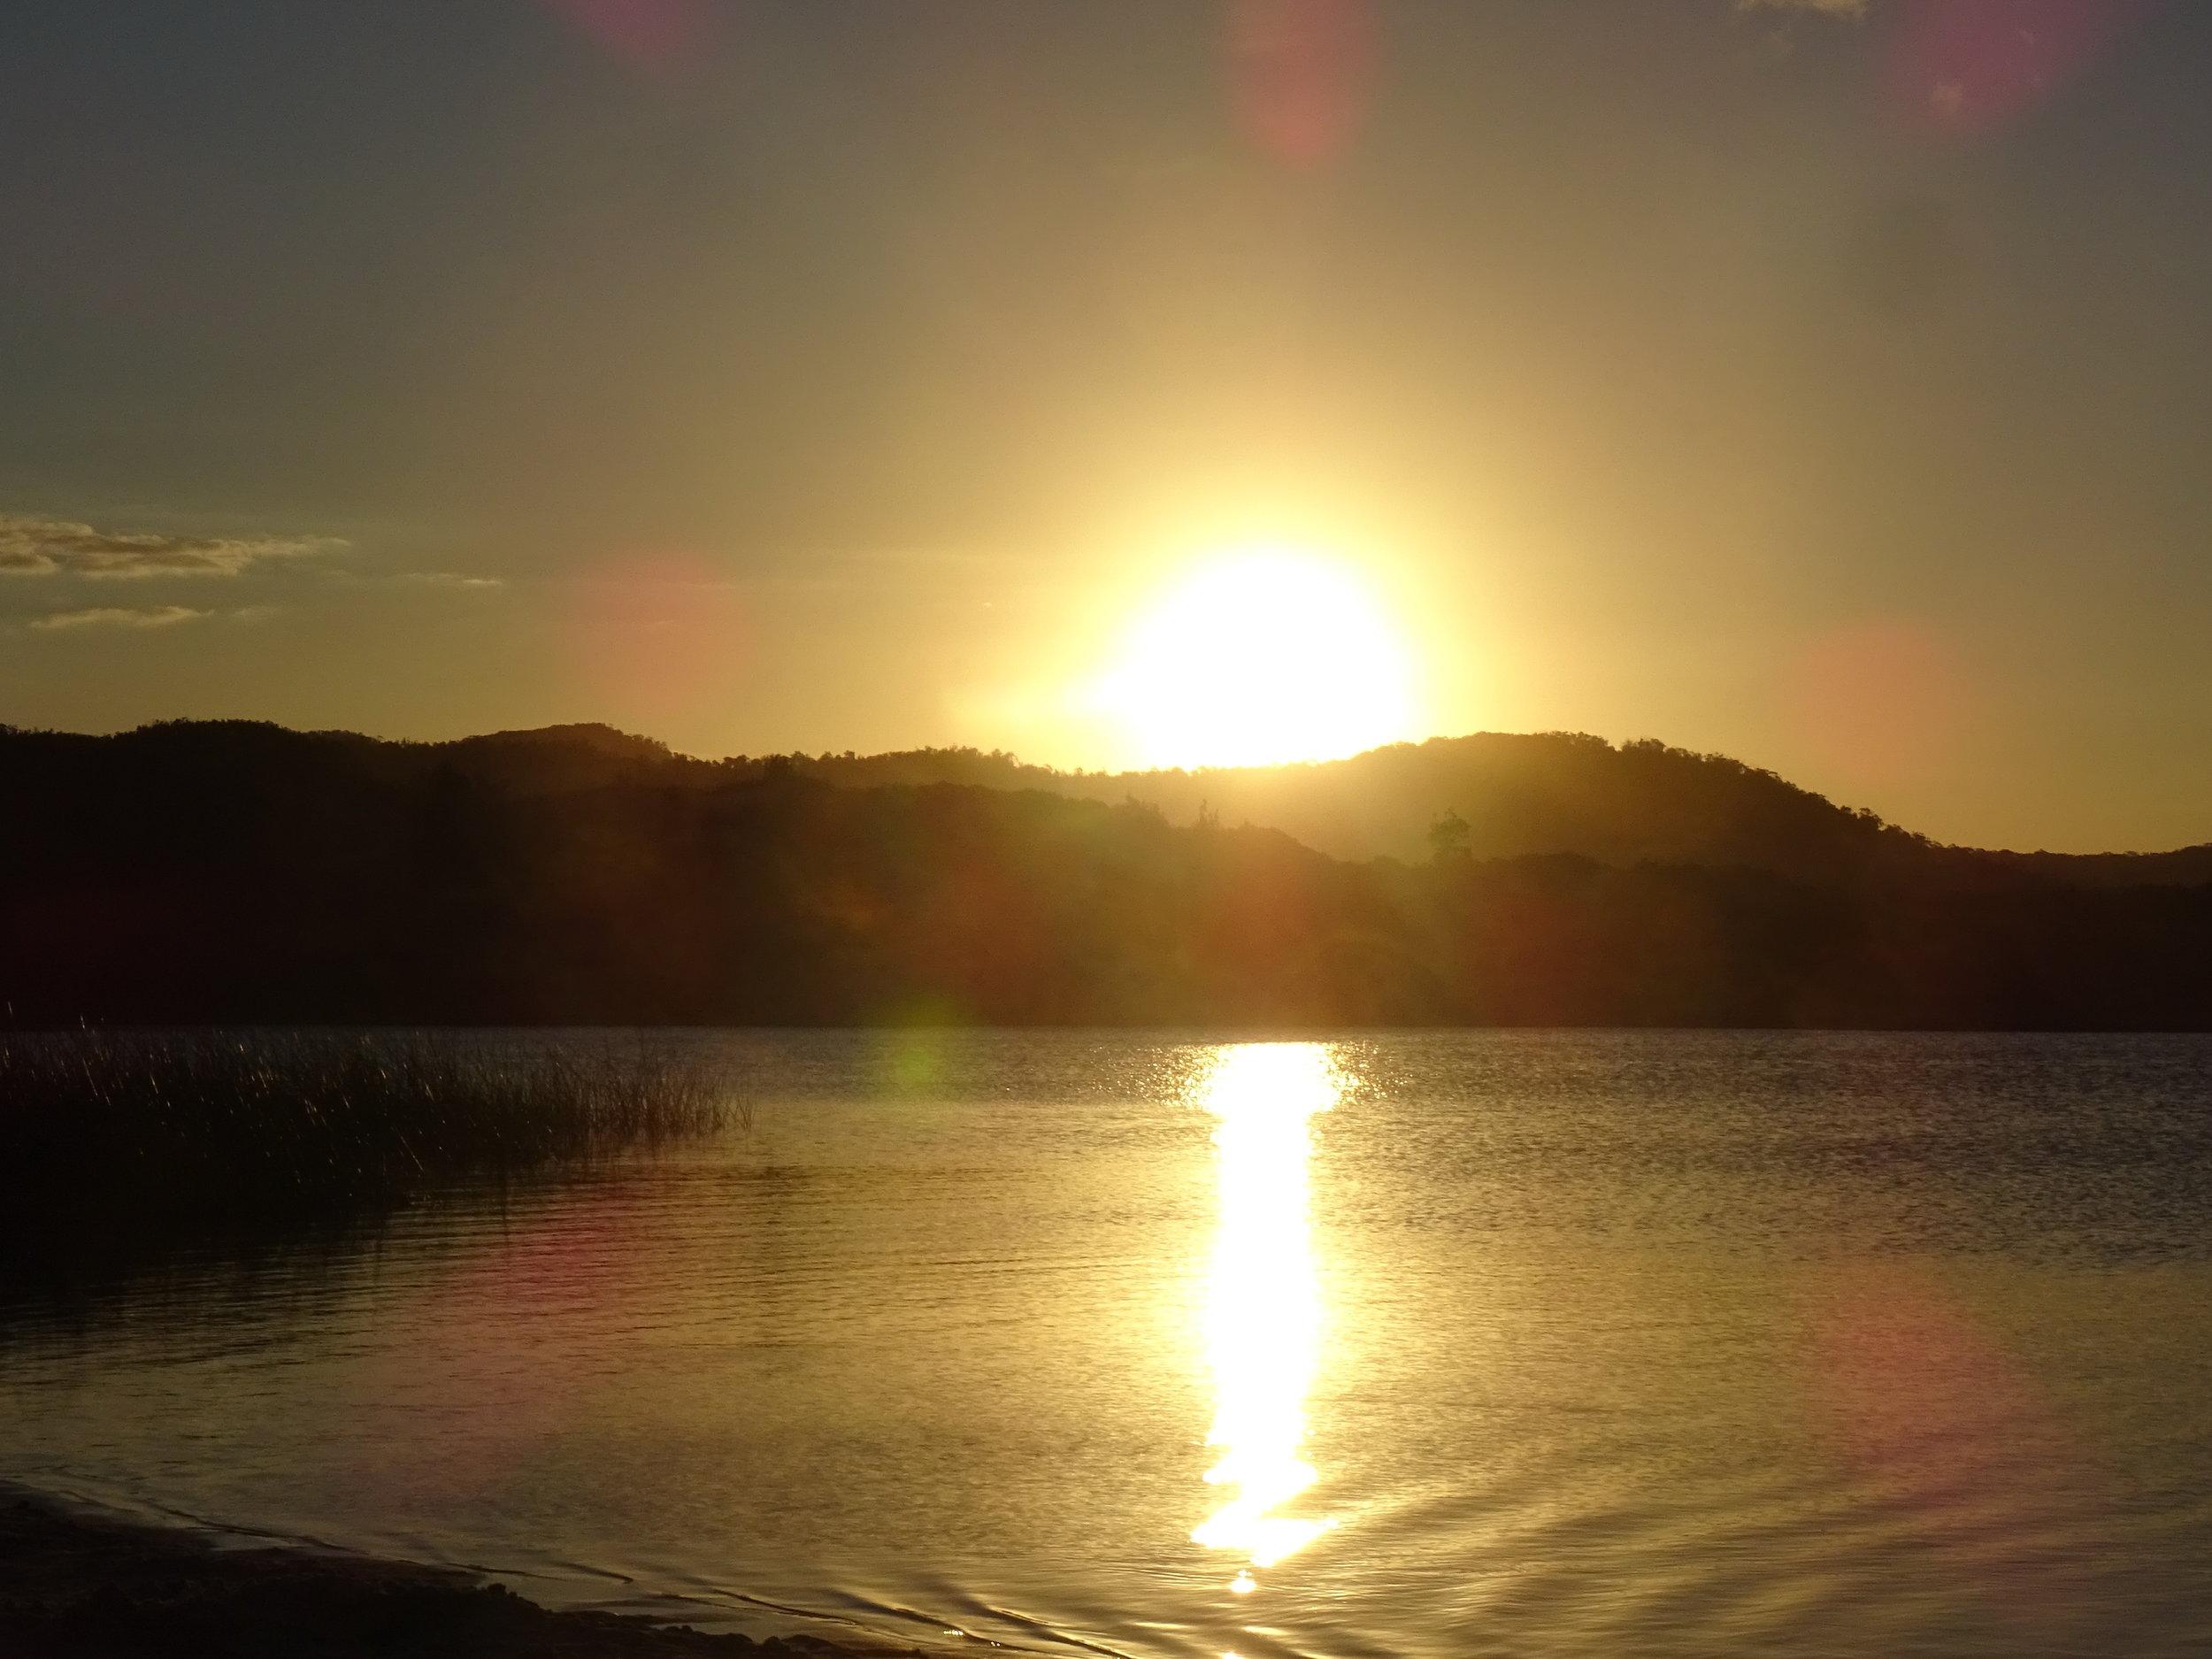 Qld, Moreton Island